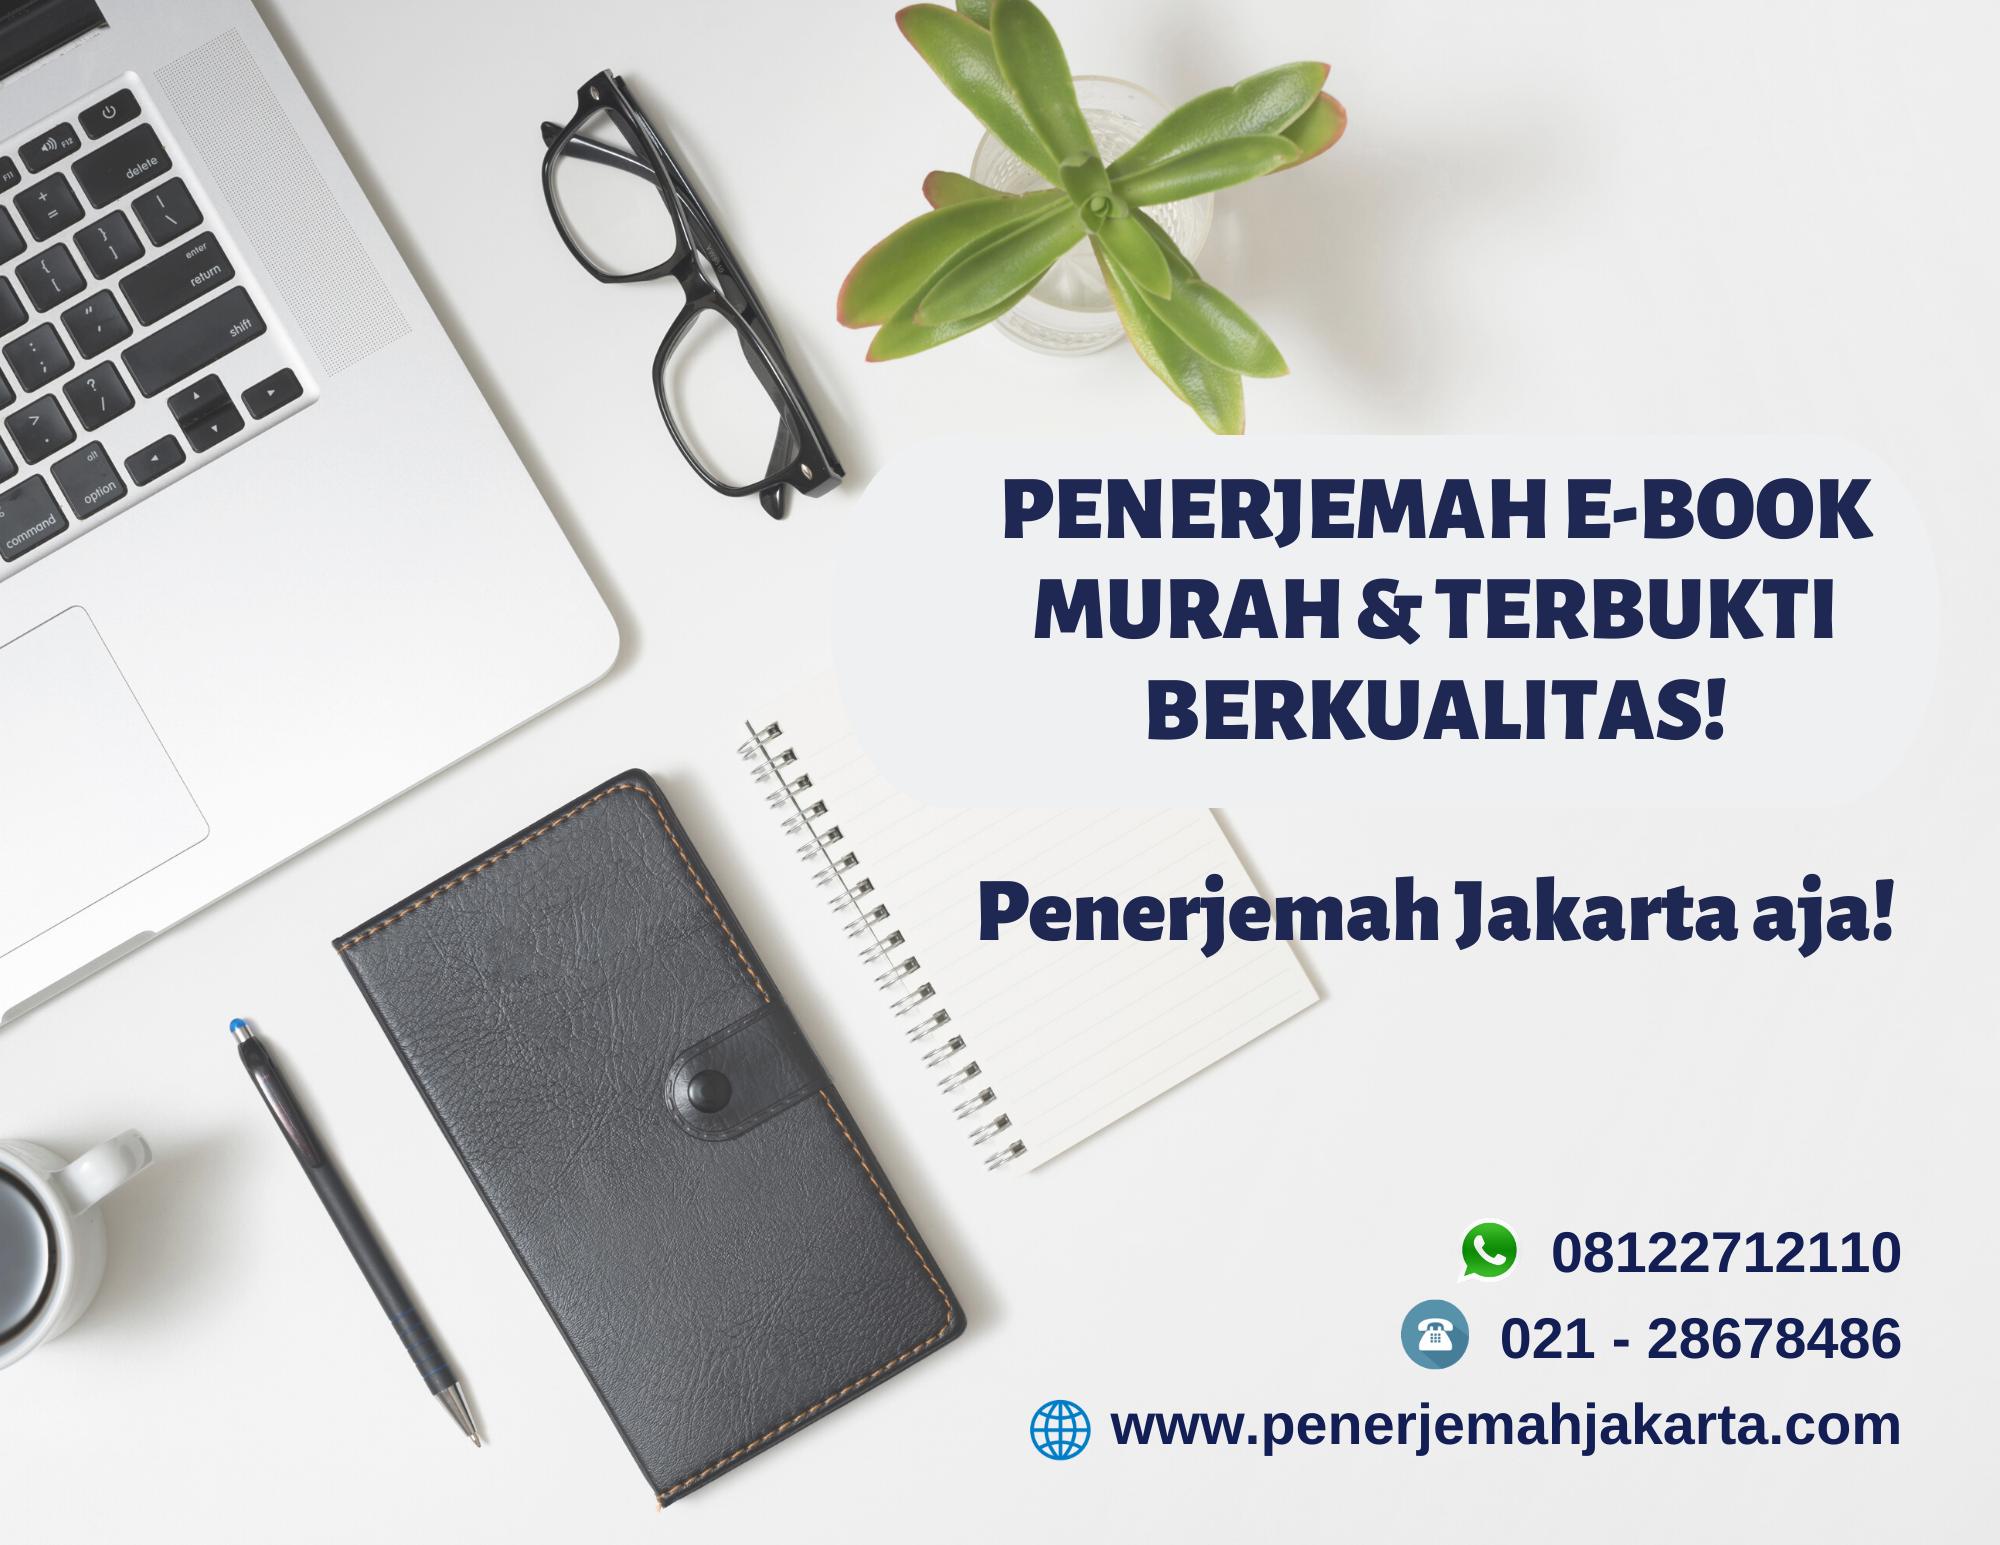 Penerjemah E-book